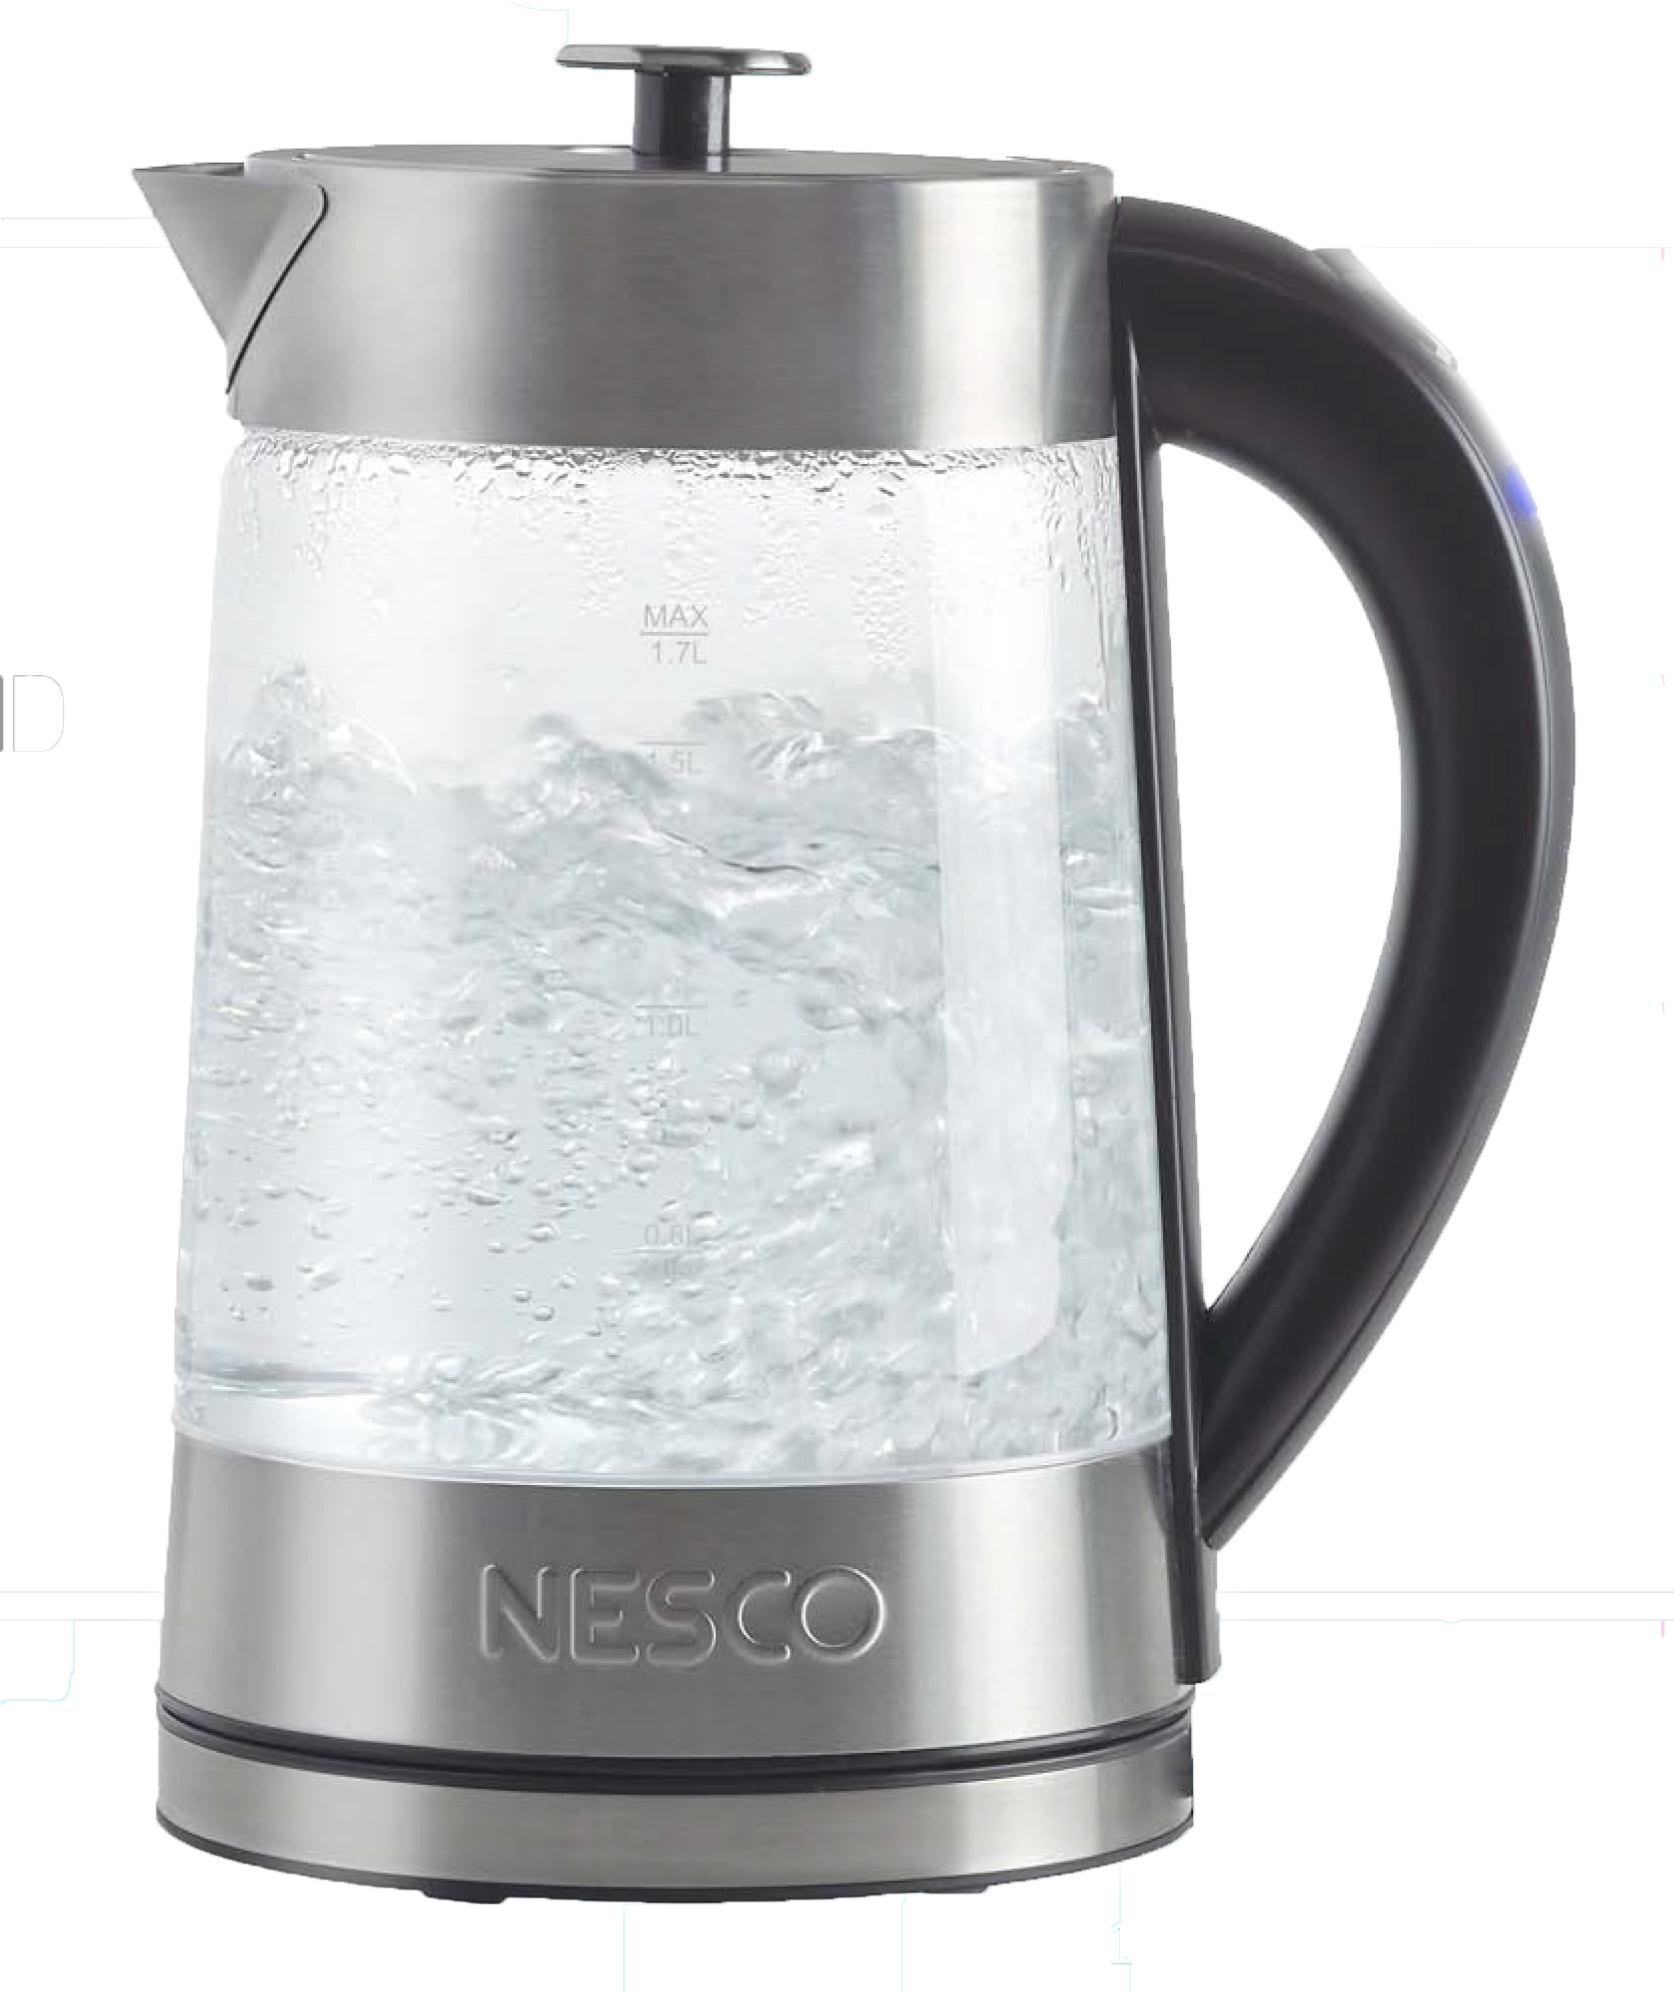 Nesco 1500 Watts, Electric Glass Water Kettle- 1.8 Qt.